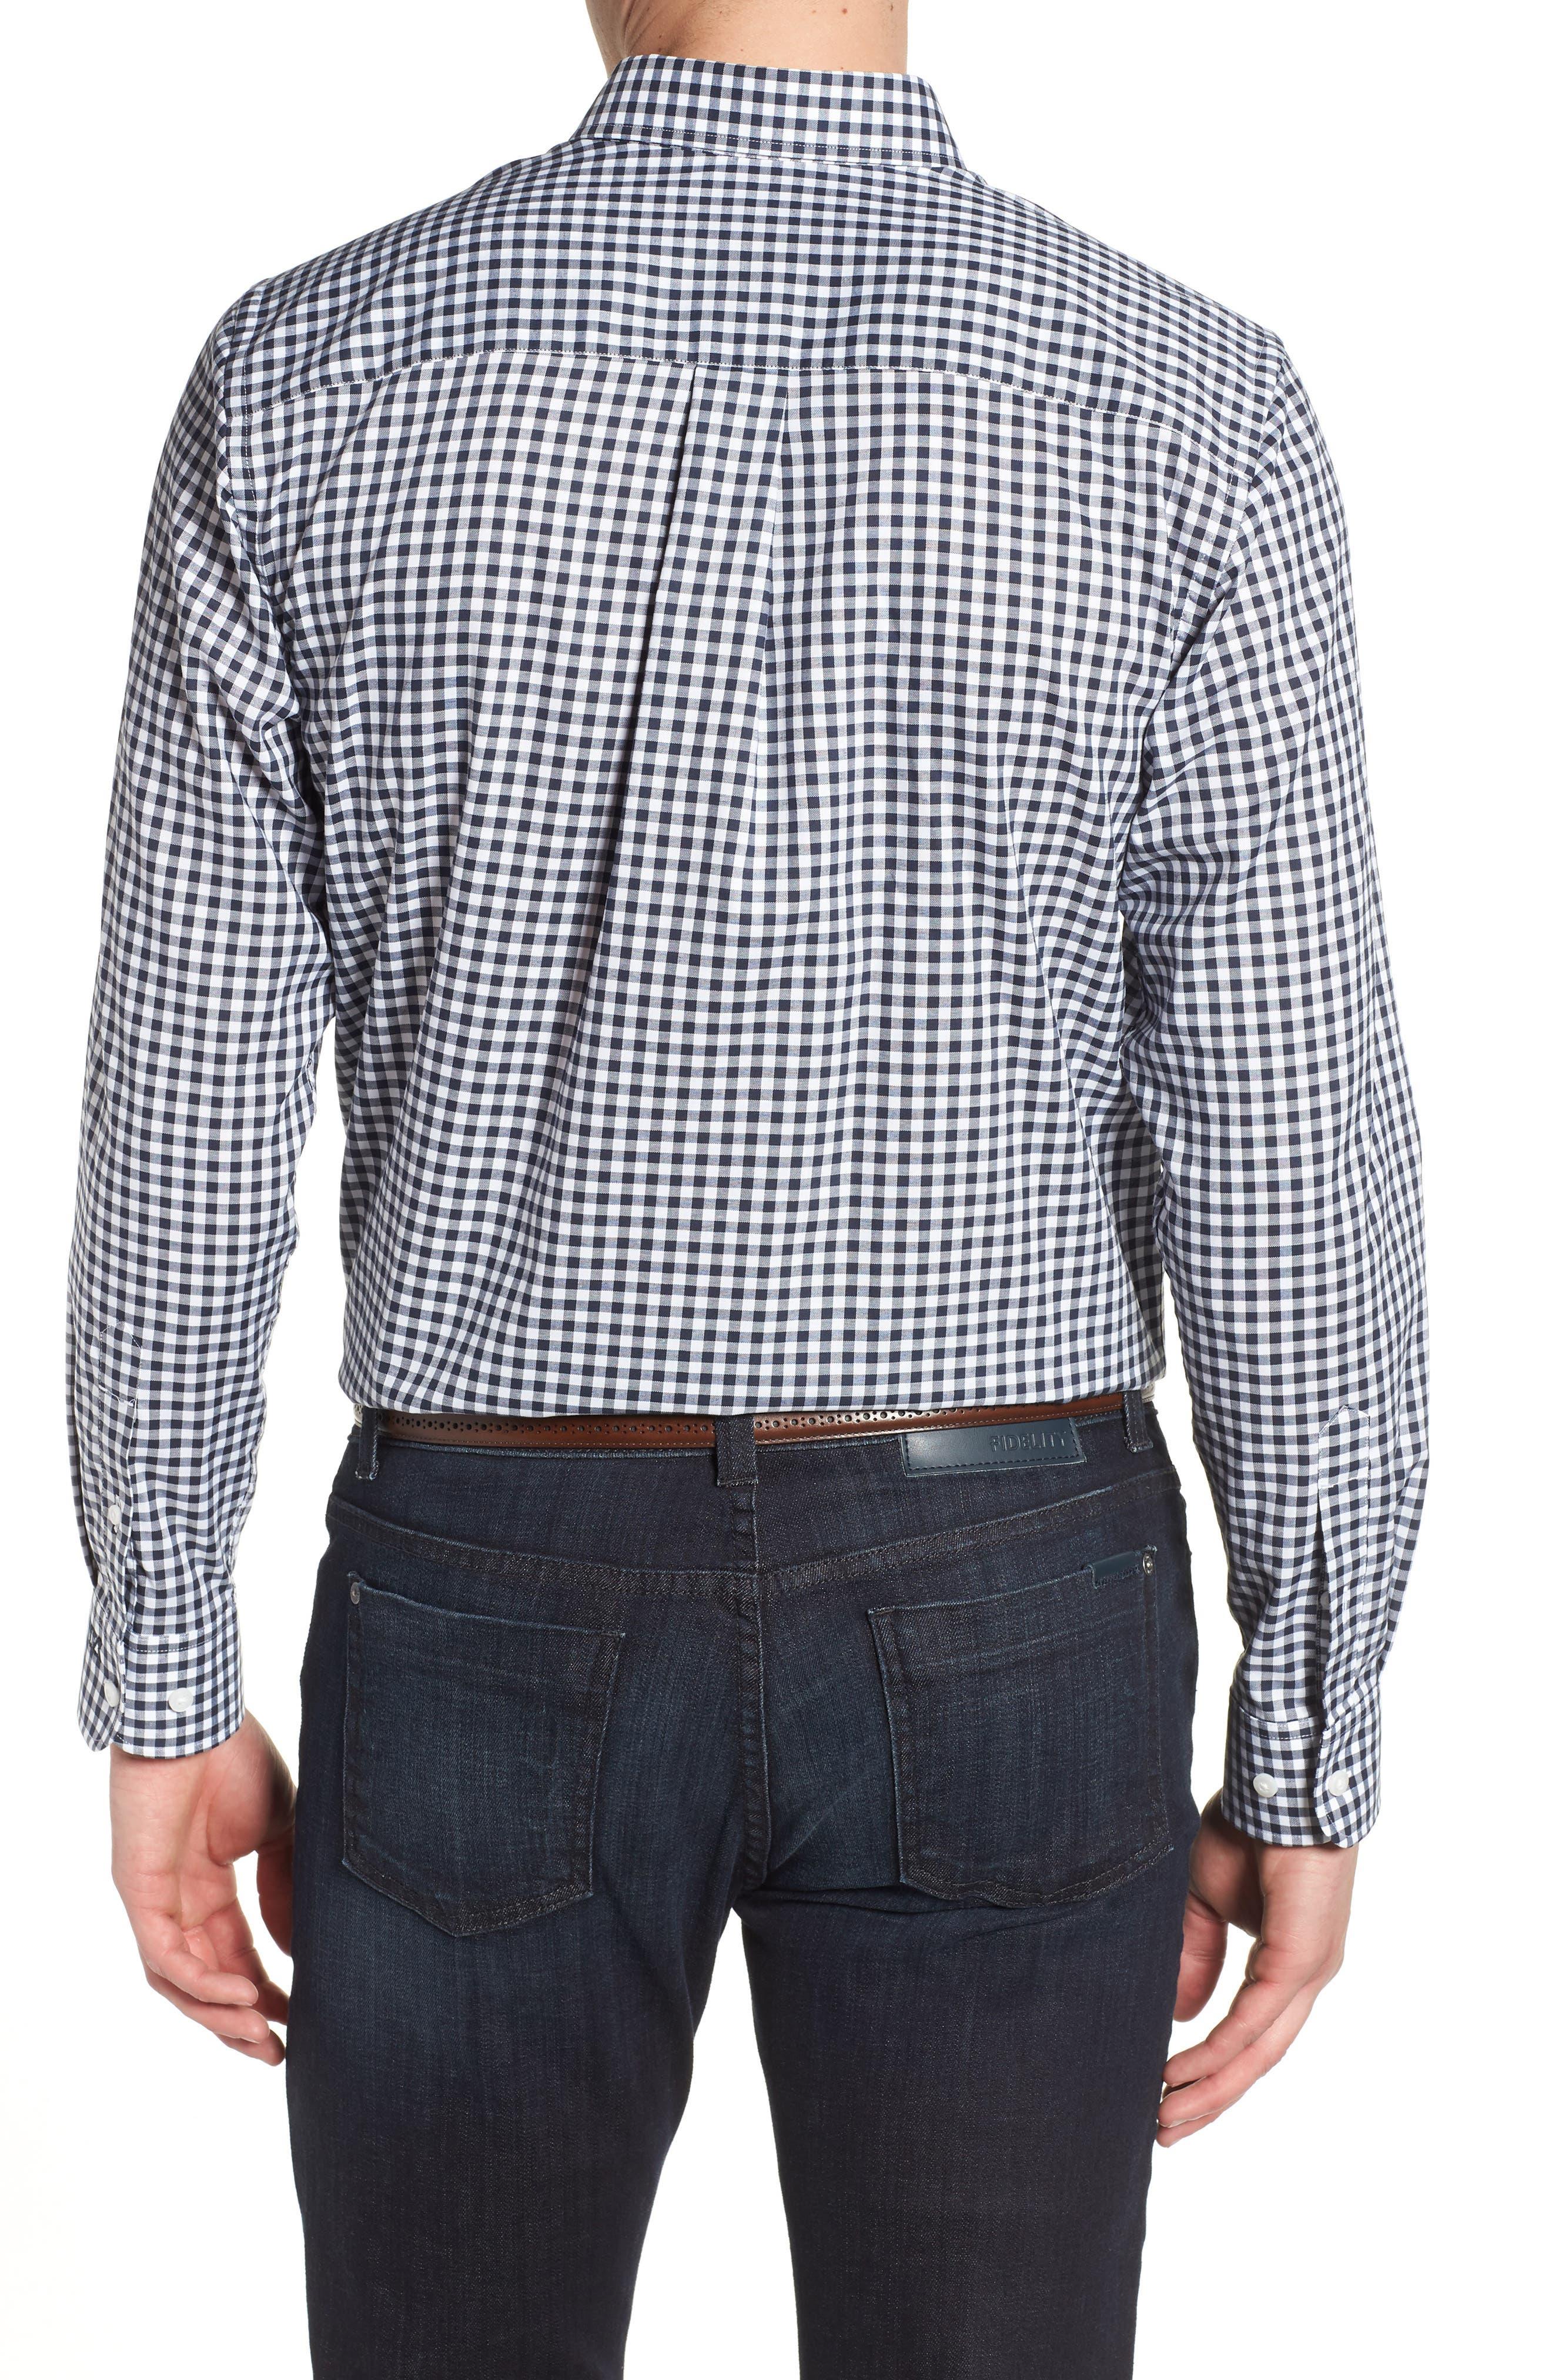 League Houston Texans Regular Fit Shirt,                             Alternate thumbnail 2, color,                             LIBERTY NAVY